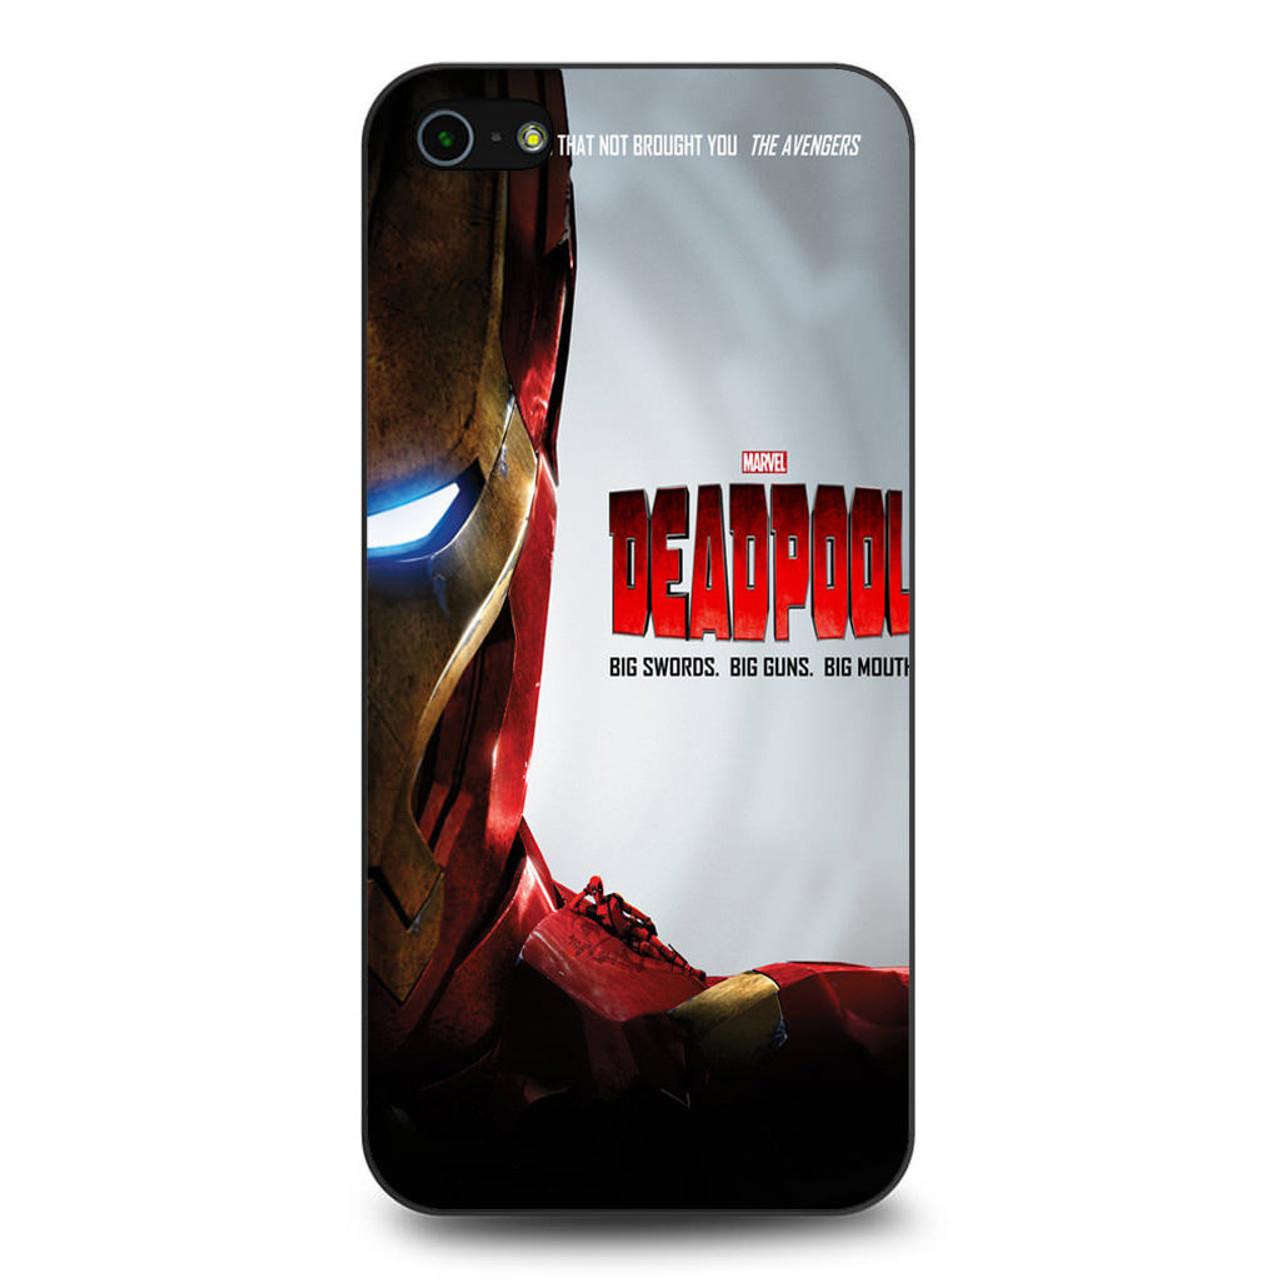 timeless design fb650 d9313 Ant Man Deadpool Parody iPhone 5/5S/SE Case